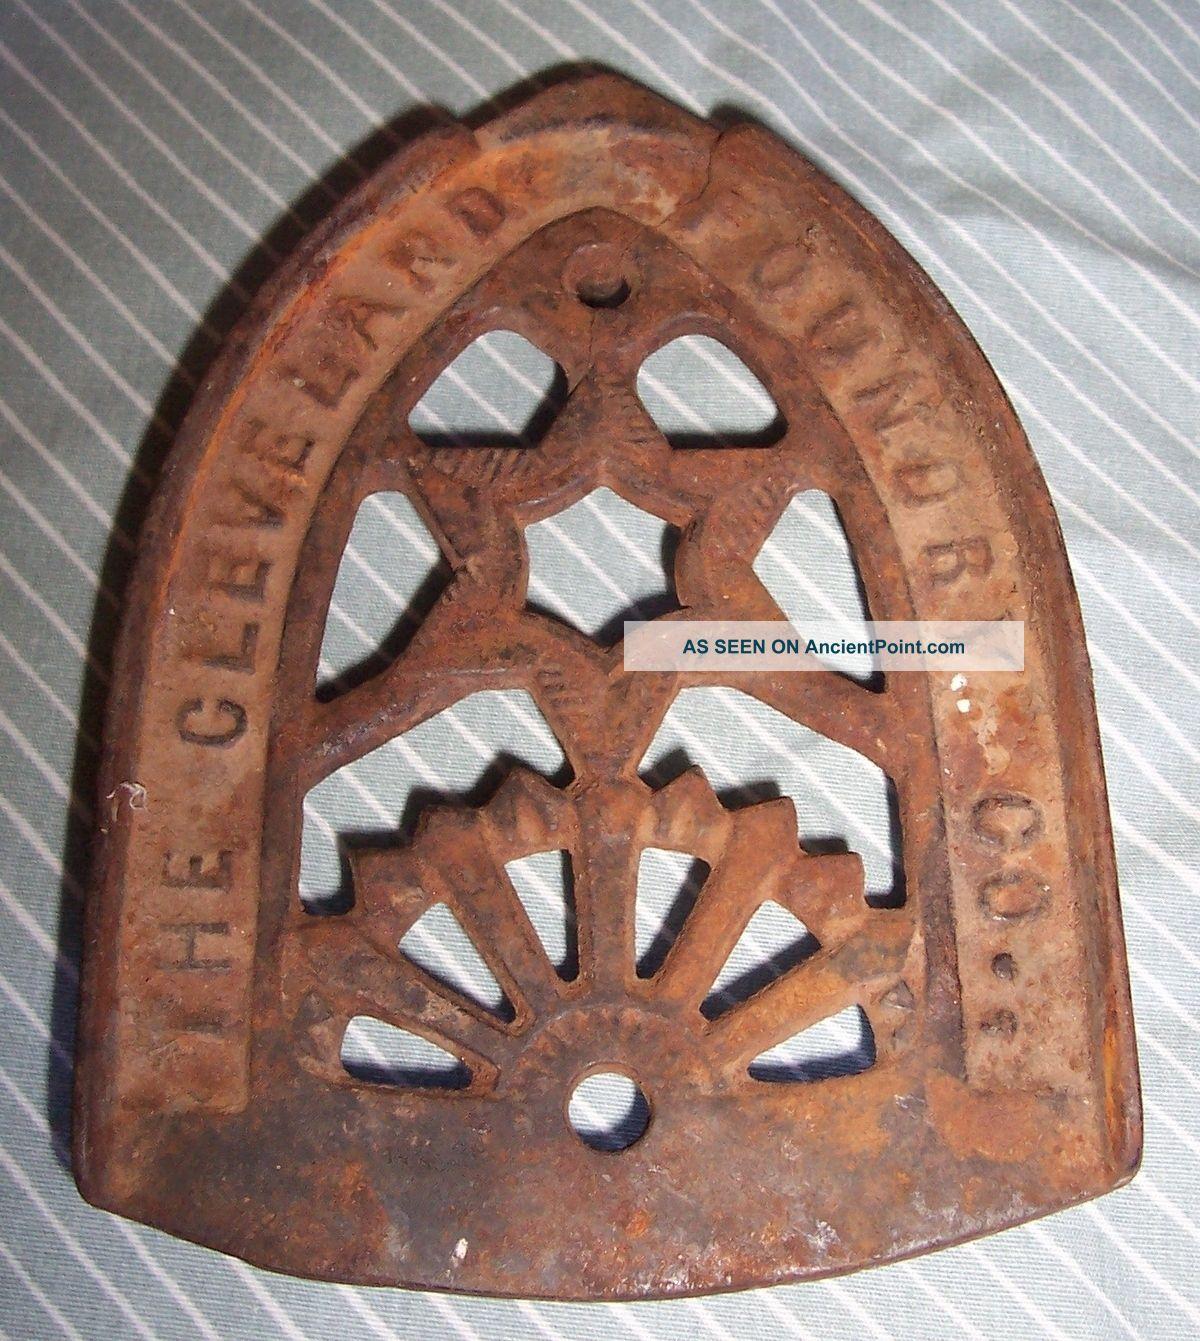 Cleveland Foundry - Vintage / Antique Cast Iron Flat Iron Trivet - No Restoration Trivets photo